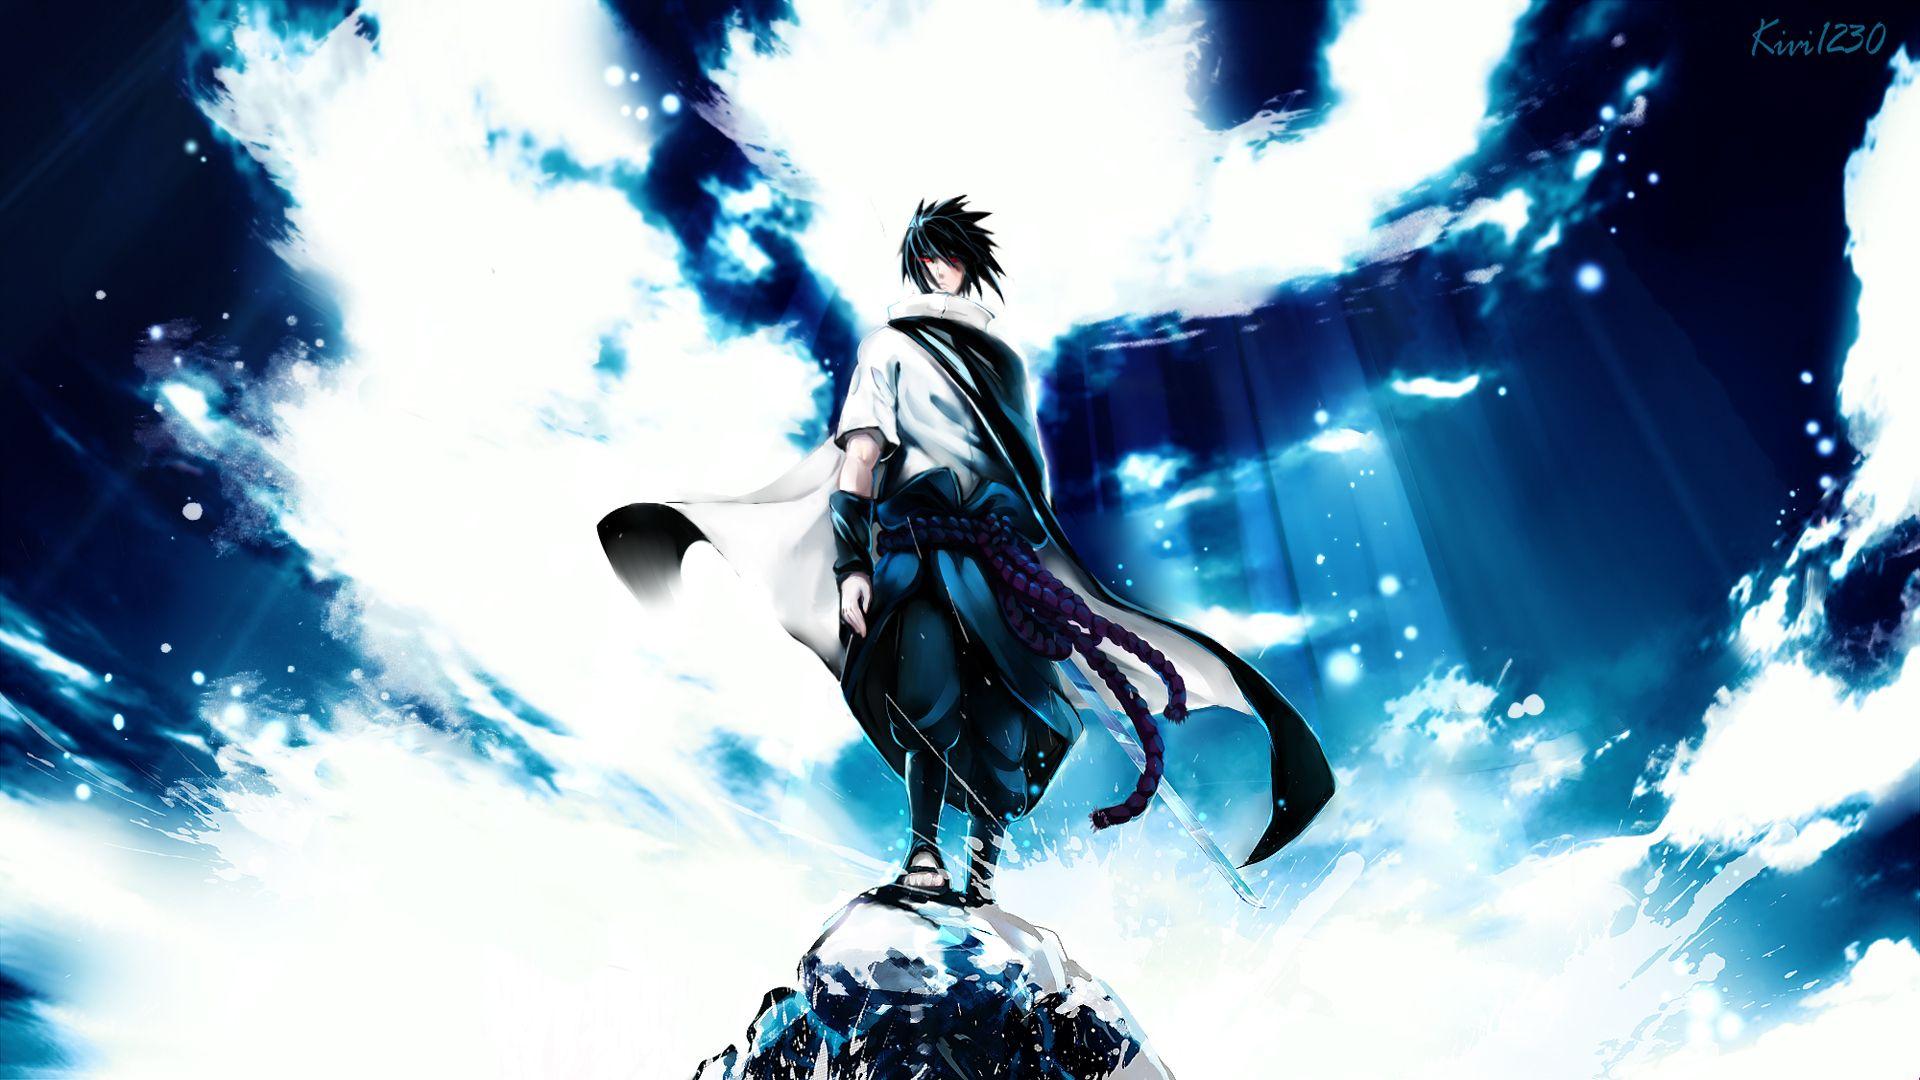 hd wallpaper anime 556 | hd wallpaper, blue wallpaper, abstract